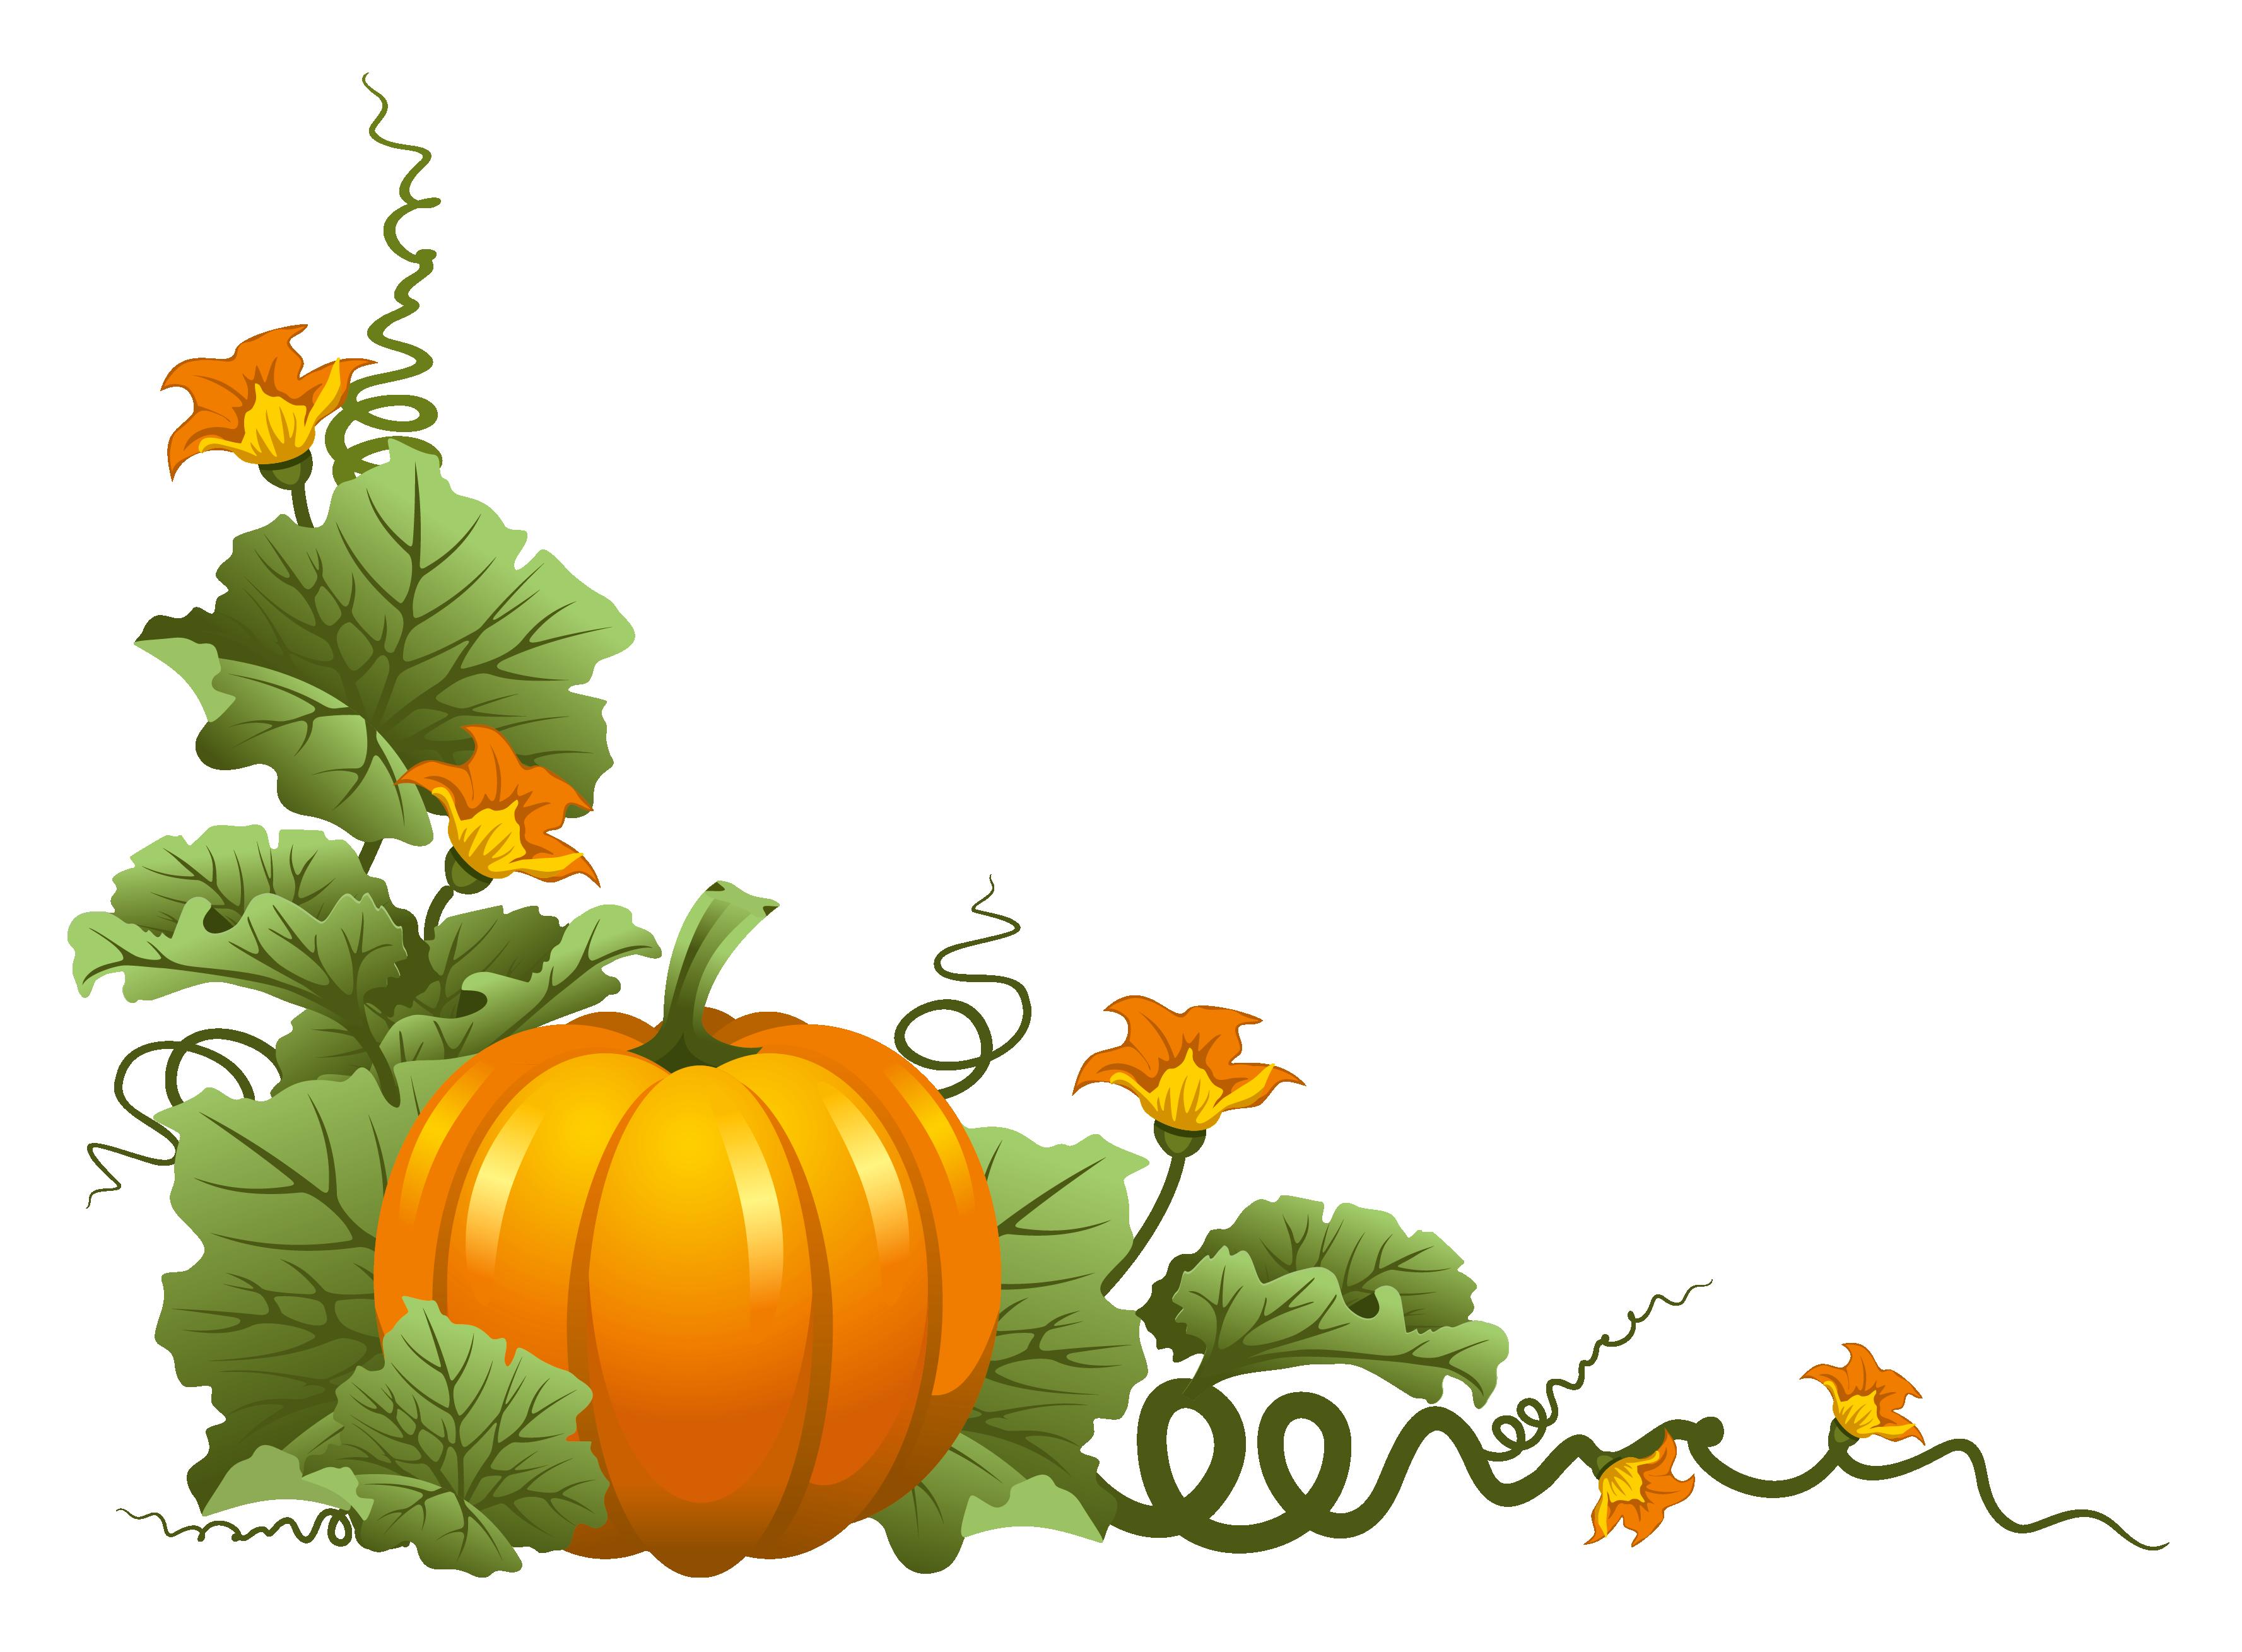 Pumpkin Outline Clipart At GetDrawings.com